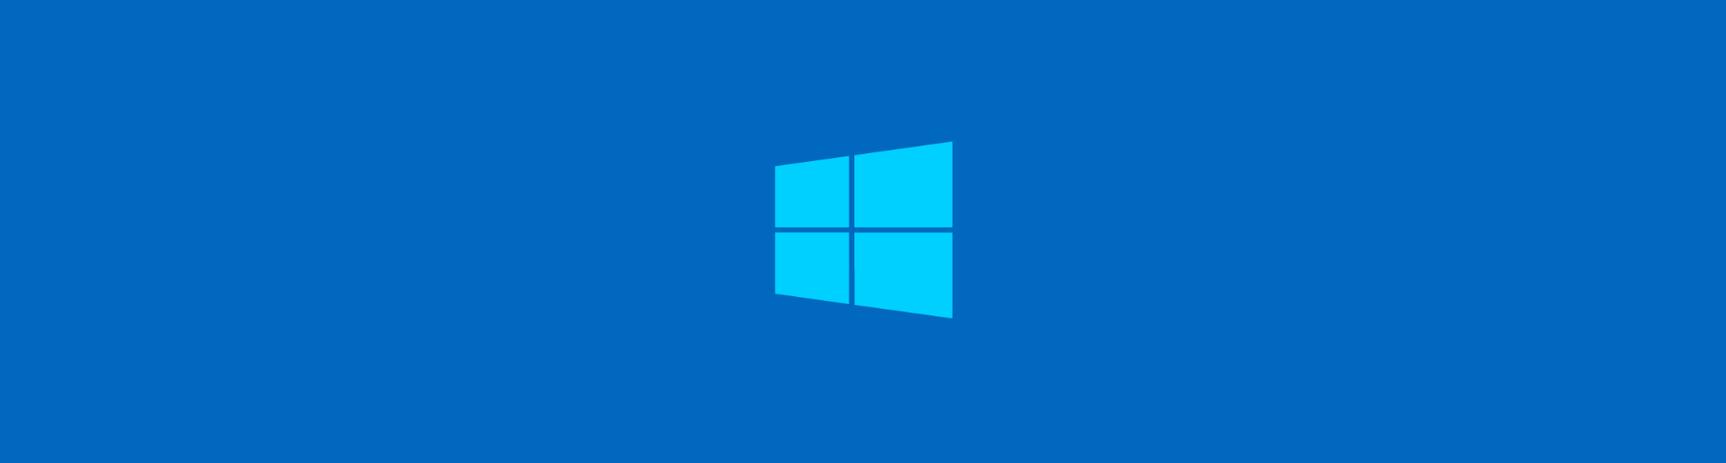 Windows 8.1 Screensaver by arkabana